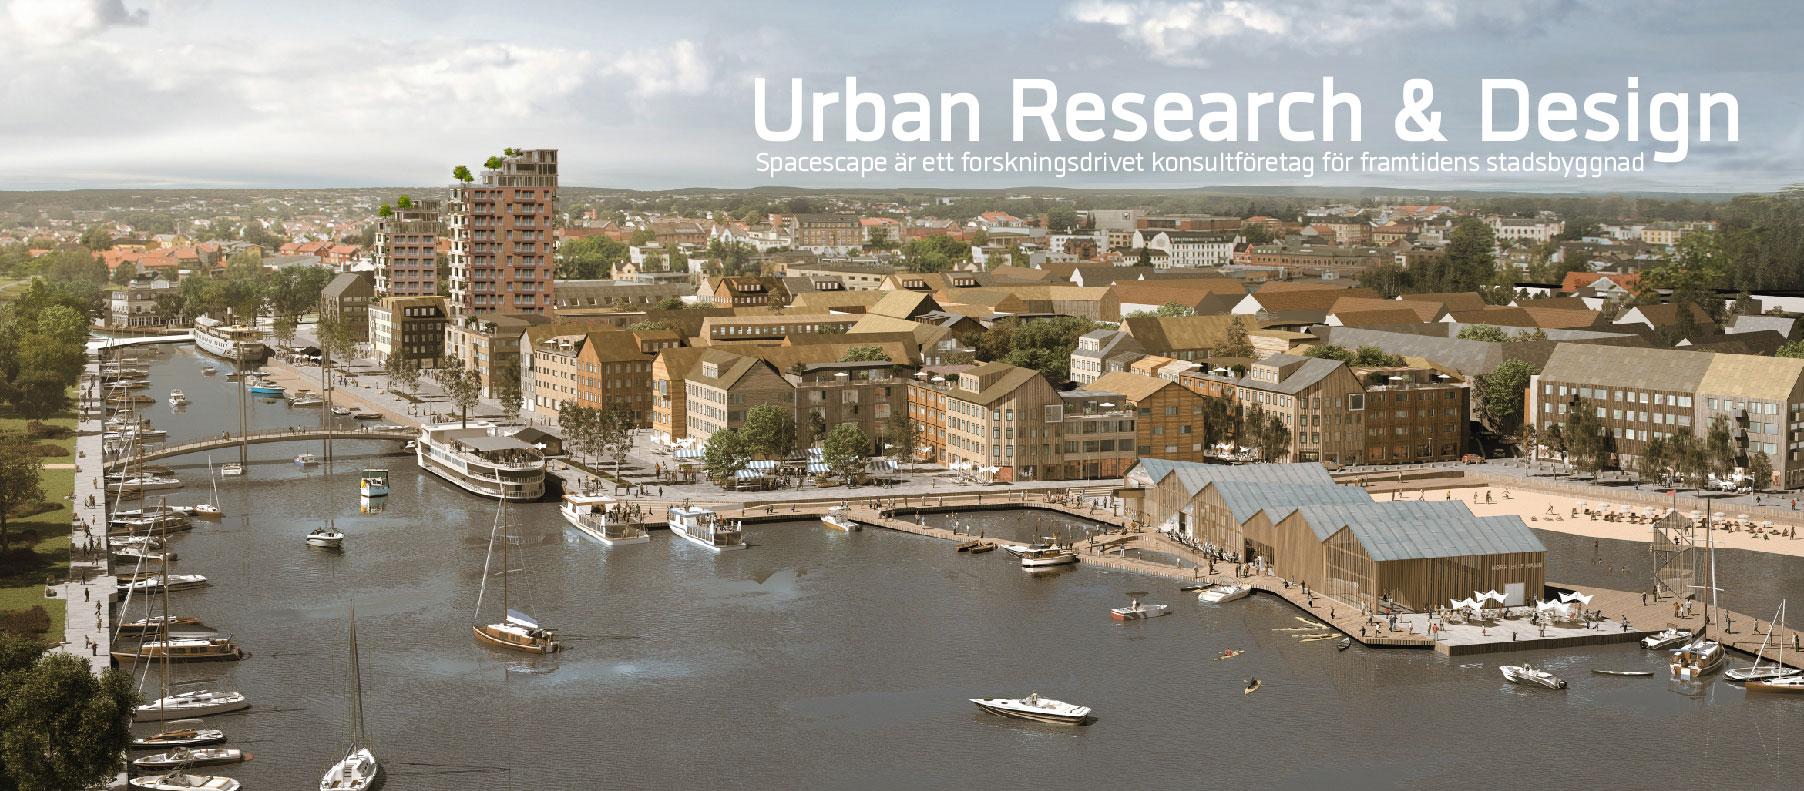 Urban Research & Design